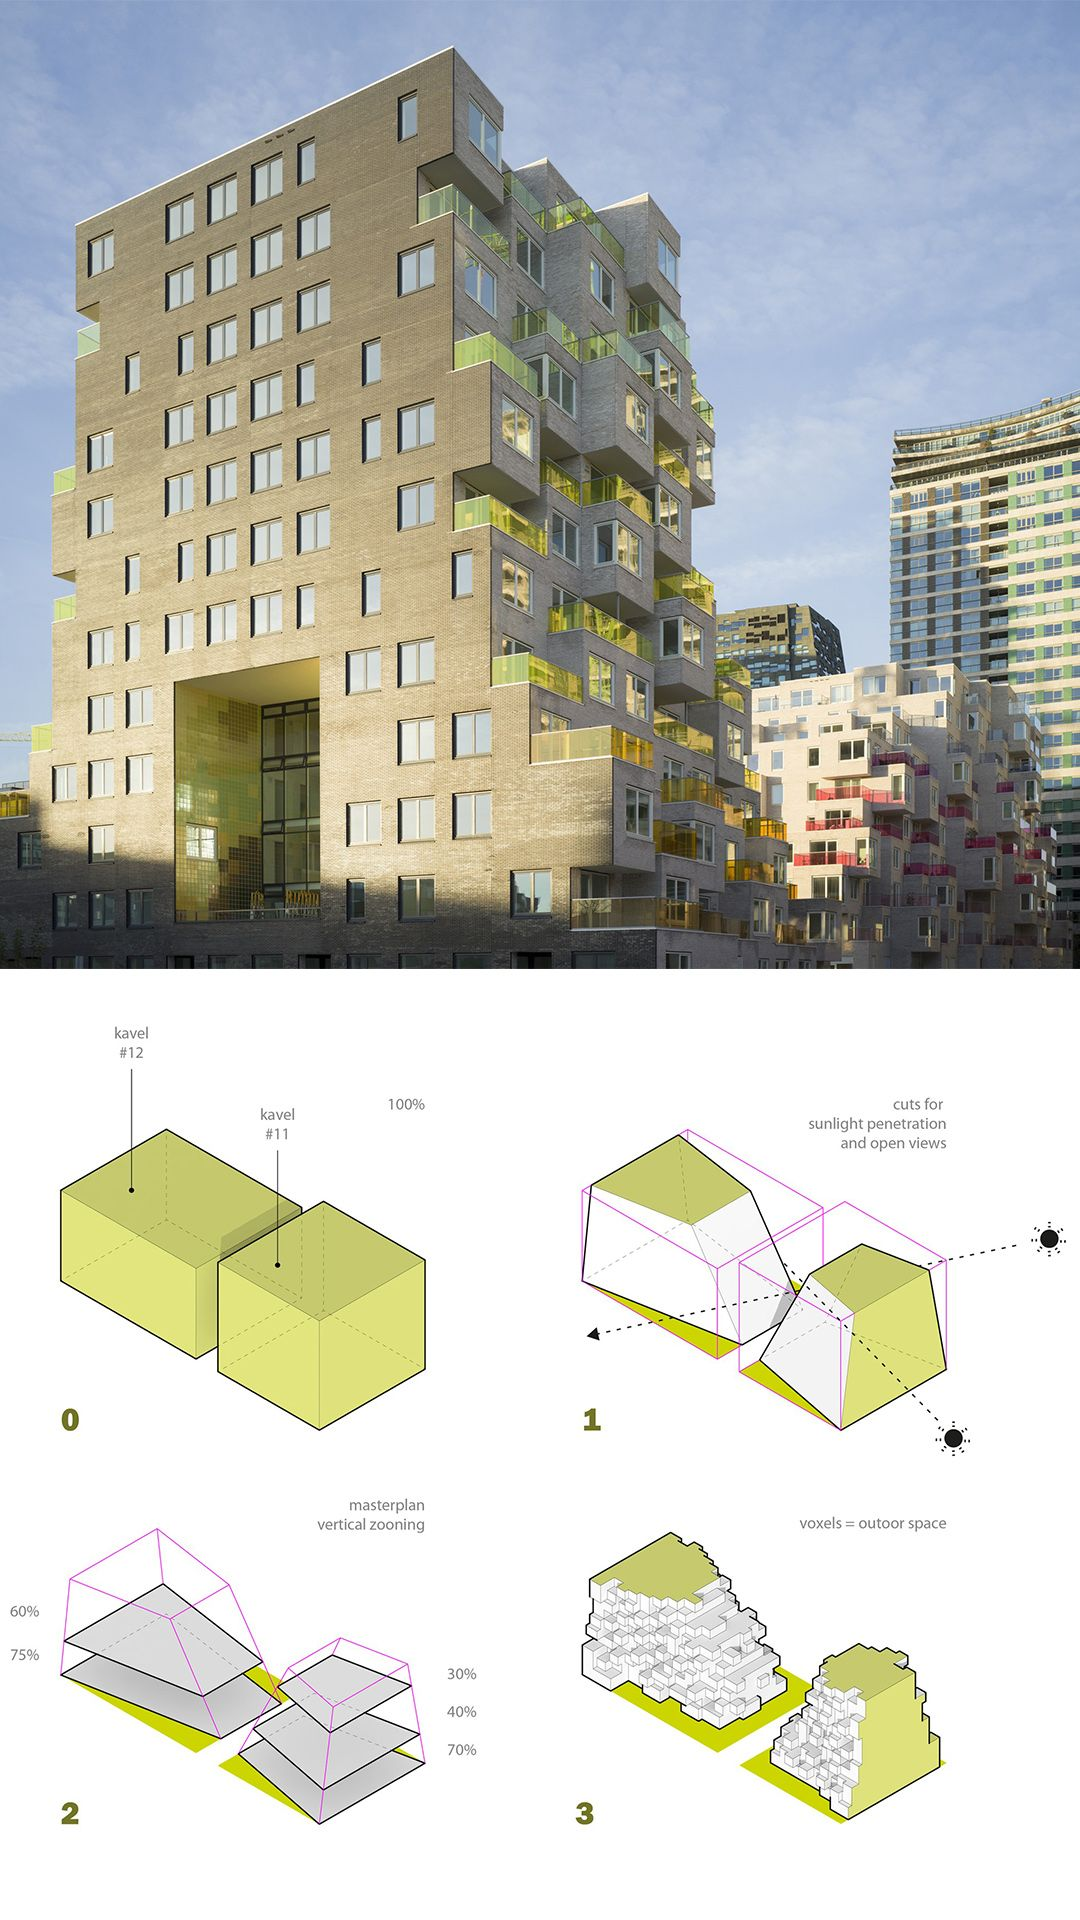 summertime housing art itecture pinterest architecture 3d building structure diagrams 3d building diagram [ 1080 x 1920 Pixel ]